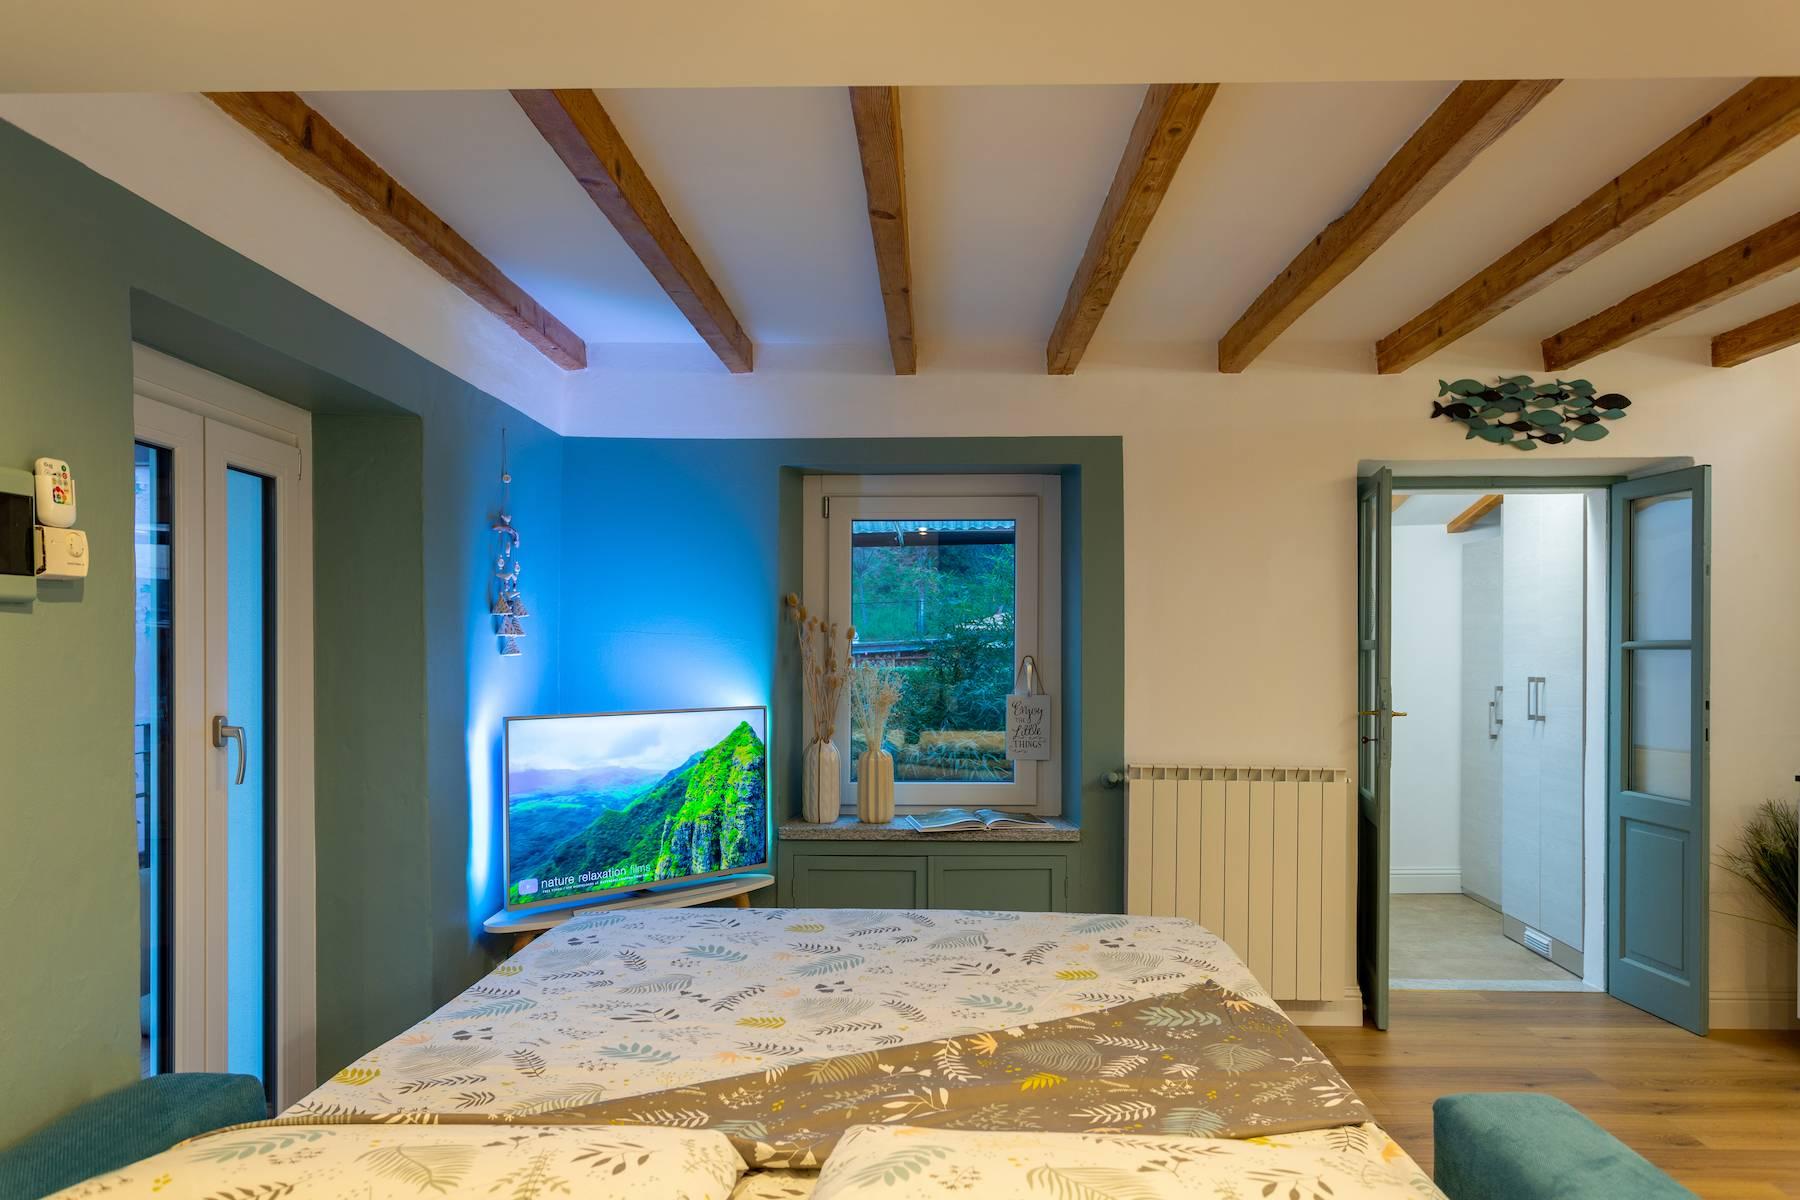 Appartamento in Vendita a Belgirate: 3 locali, 62 mq - Foto 15